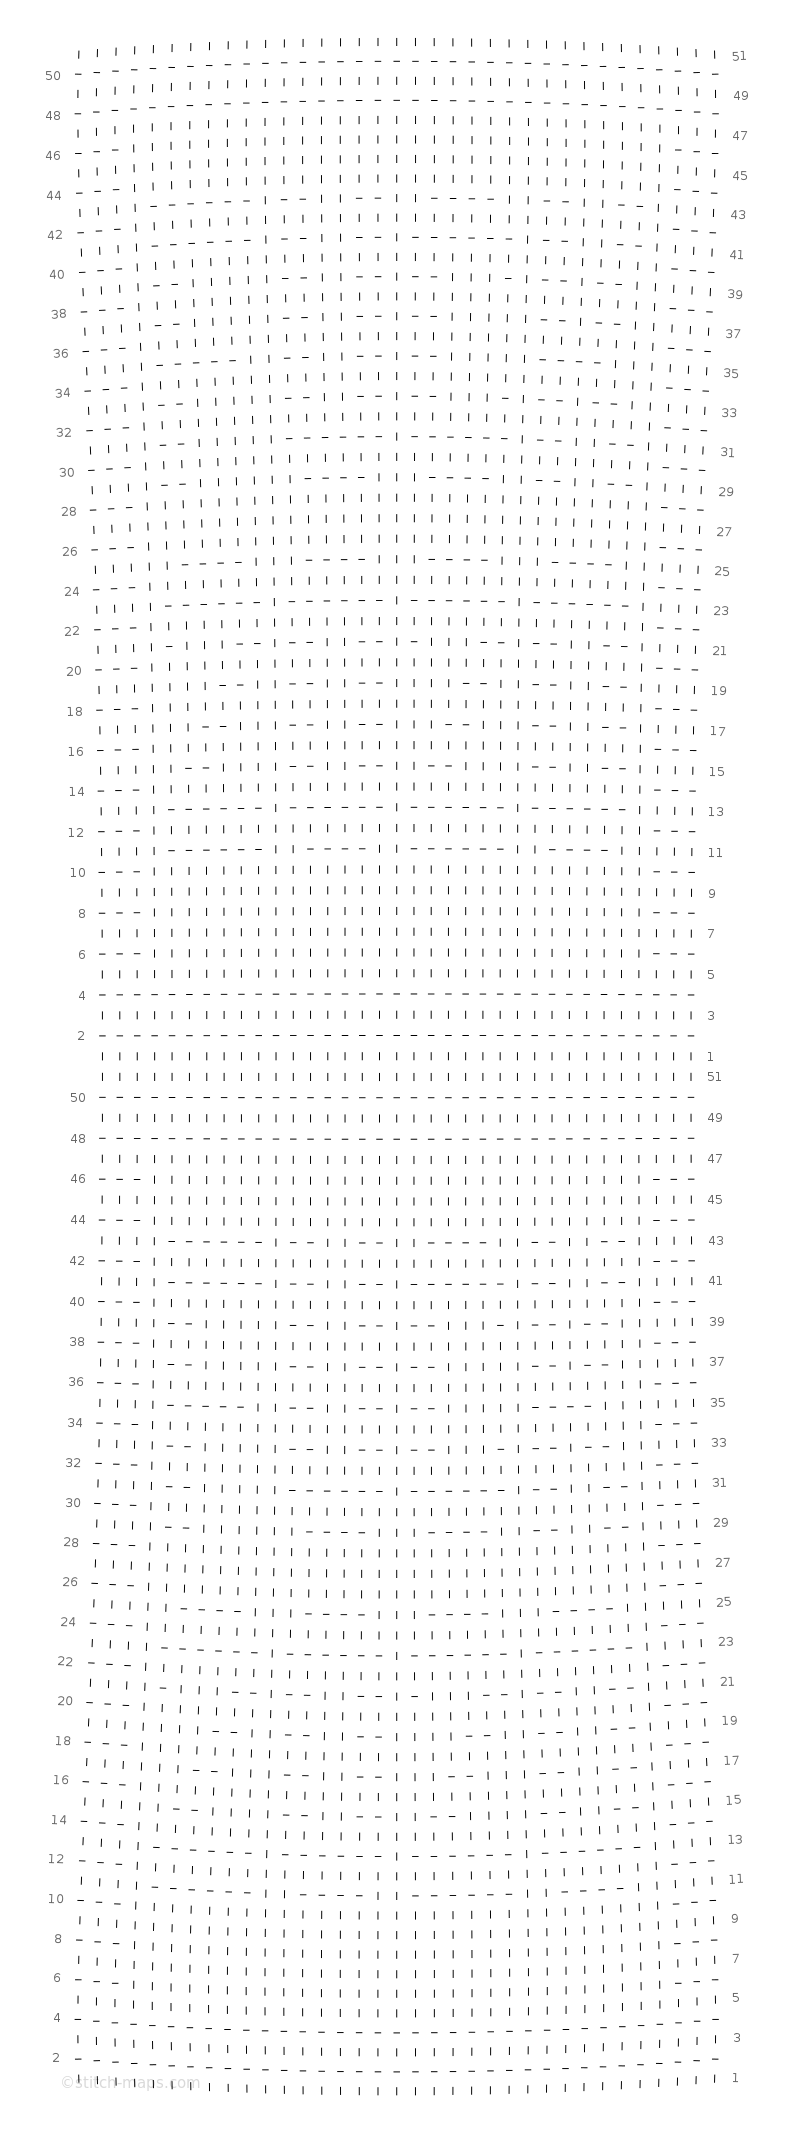 Fuck 2020 chart